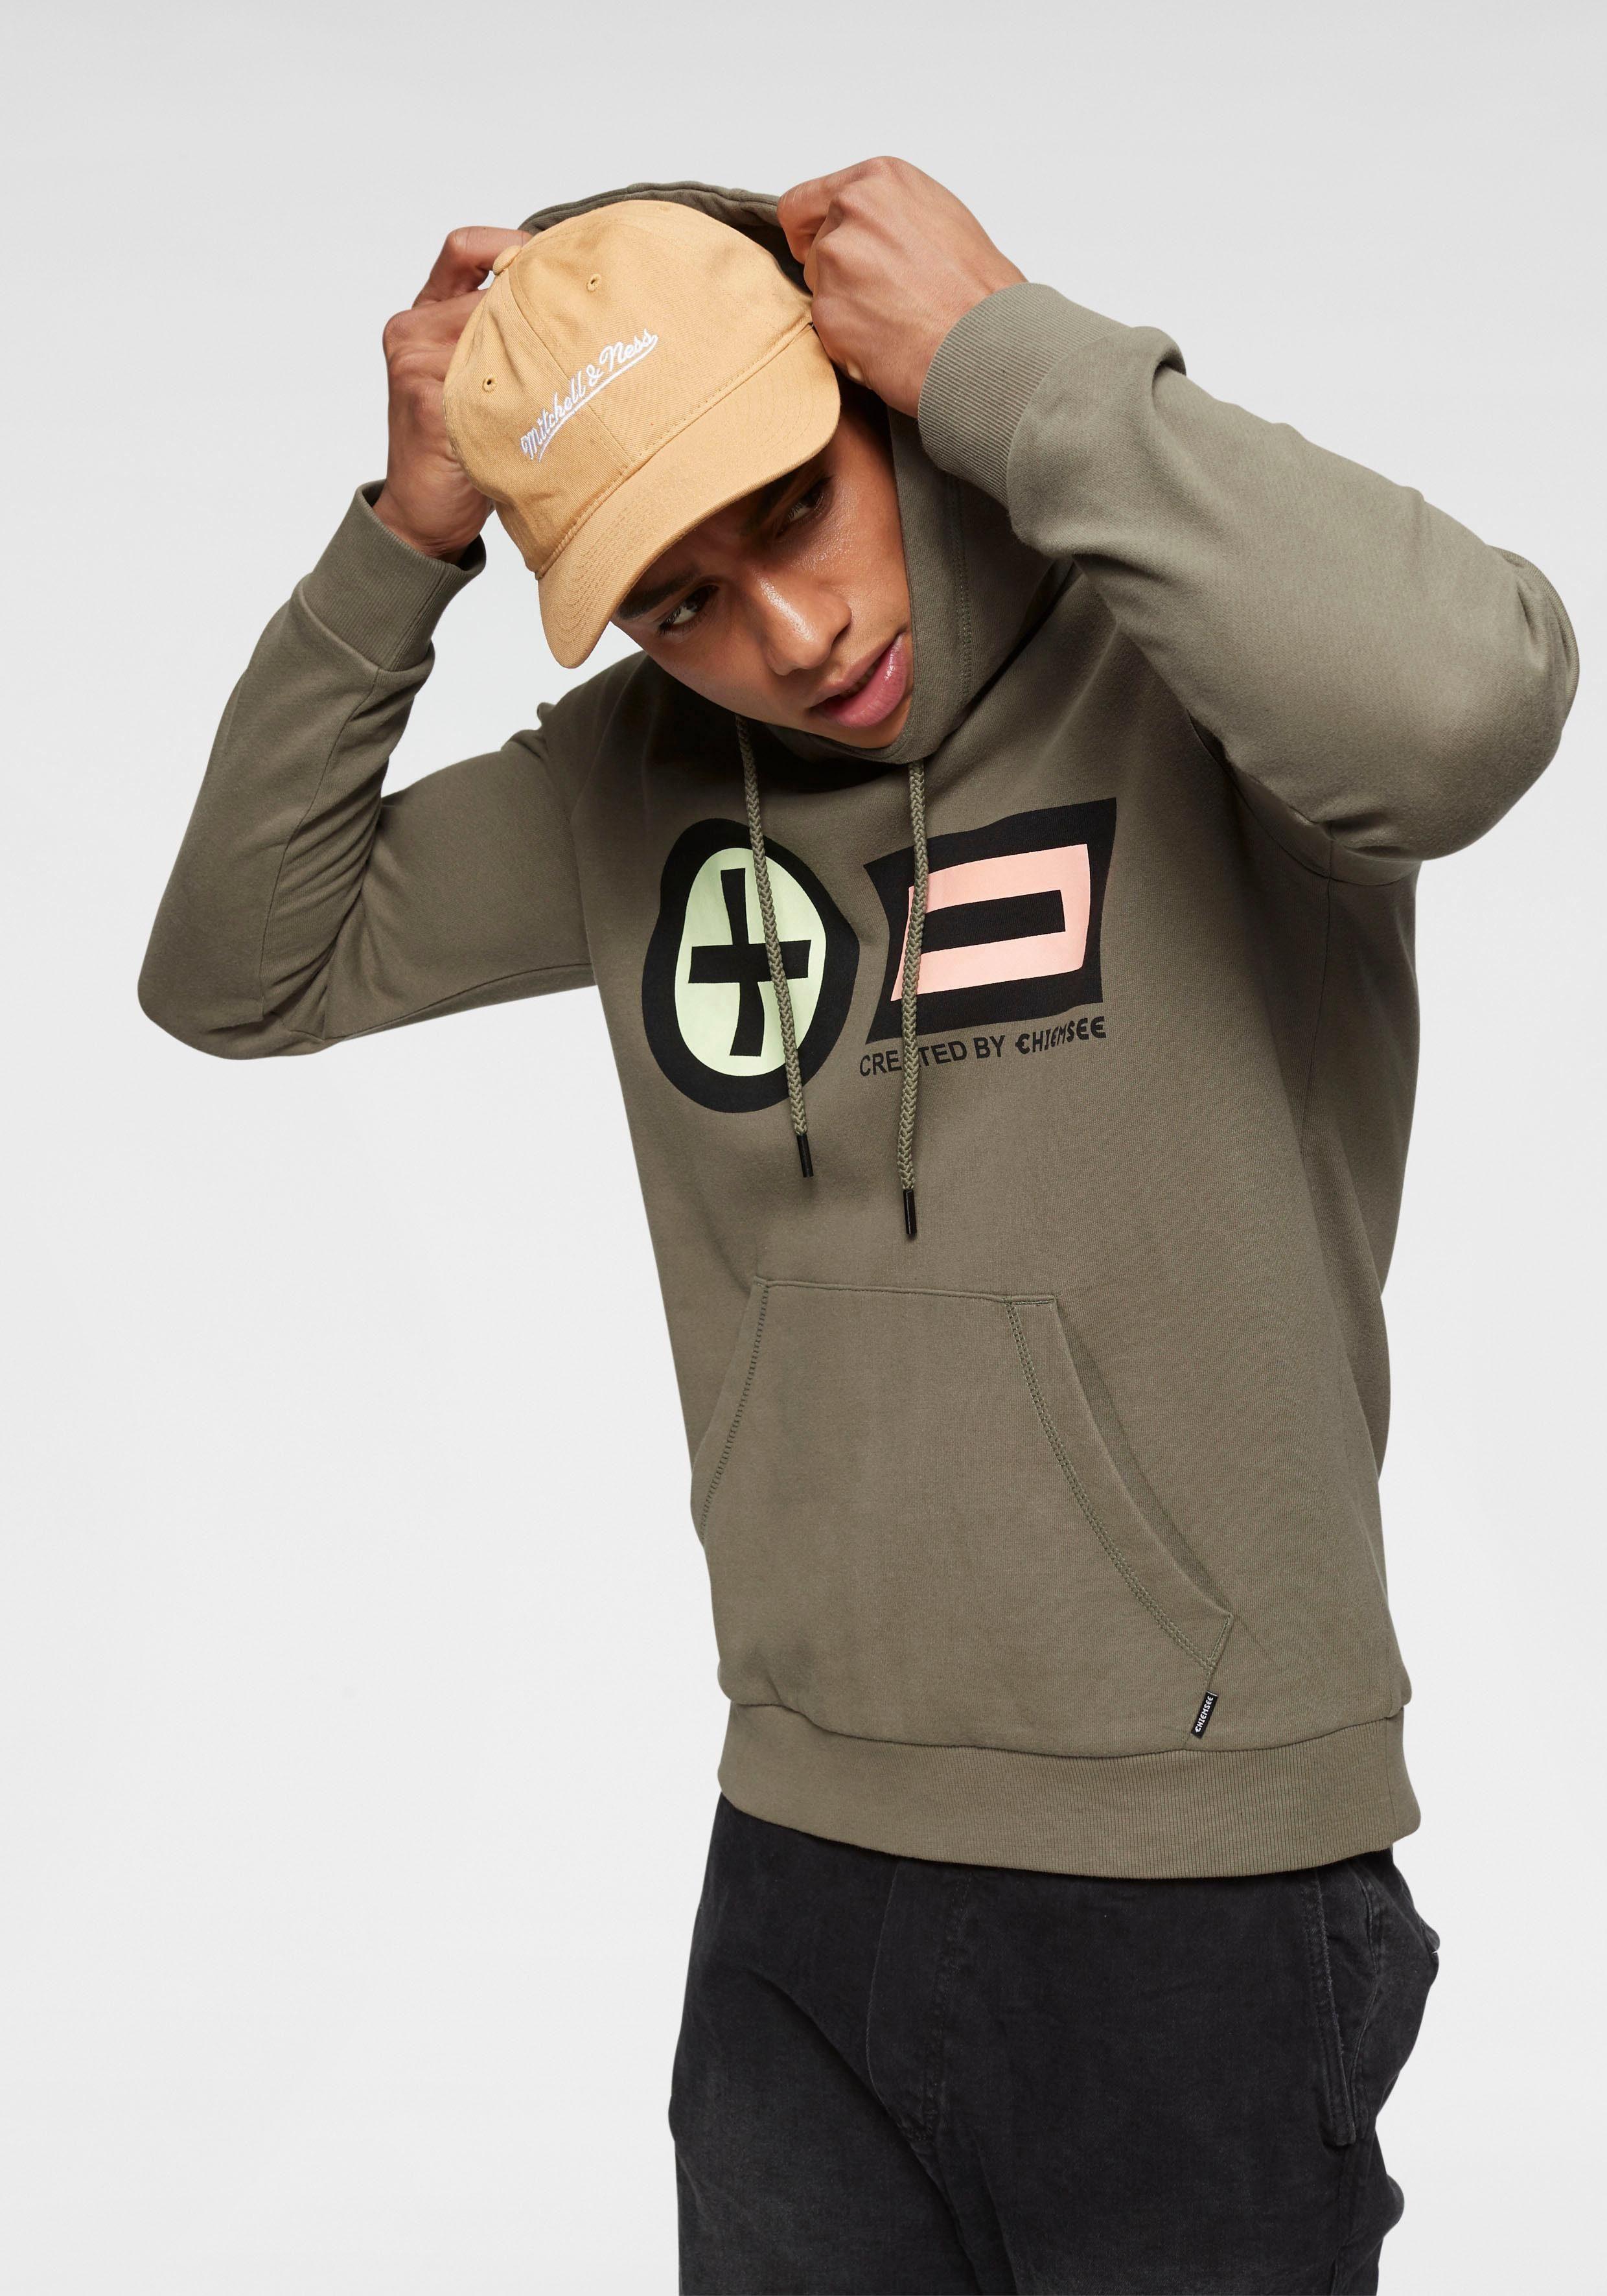 Chiemsee Online Kapuzensweatshirt Online Kapuzensweatshirt Kaufen Chiemsee Kapuzensweatshirt Kaufen Kaufen Online Chiemsee eDH9YbWI2E